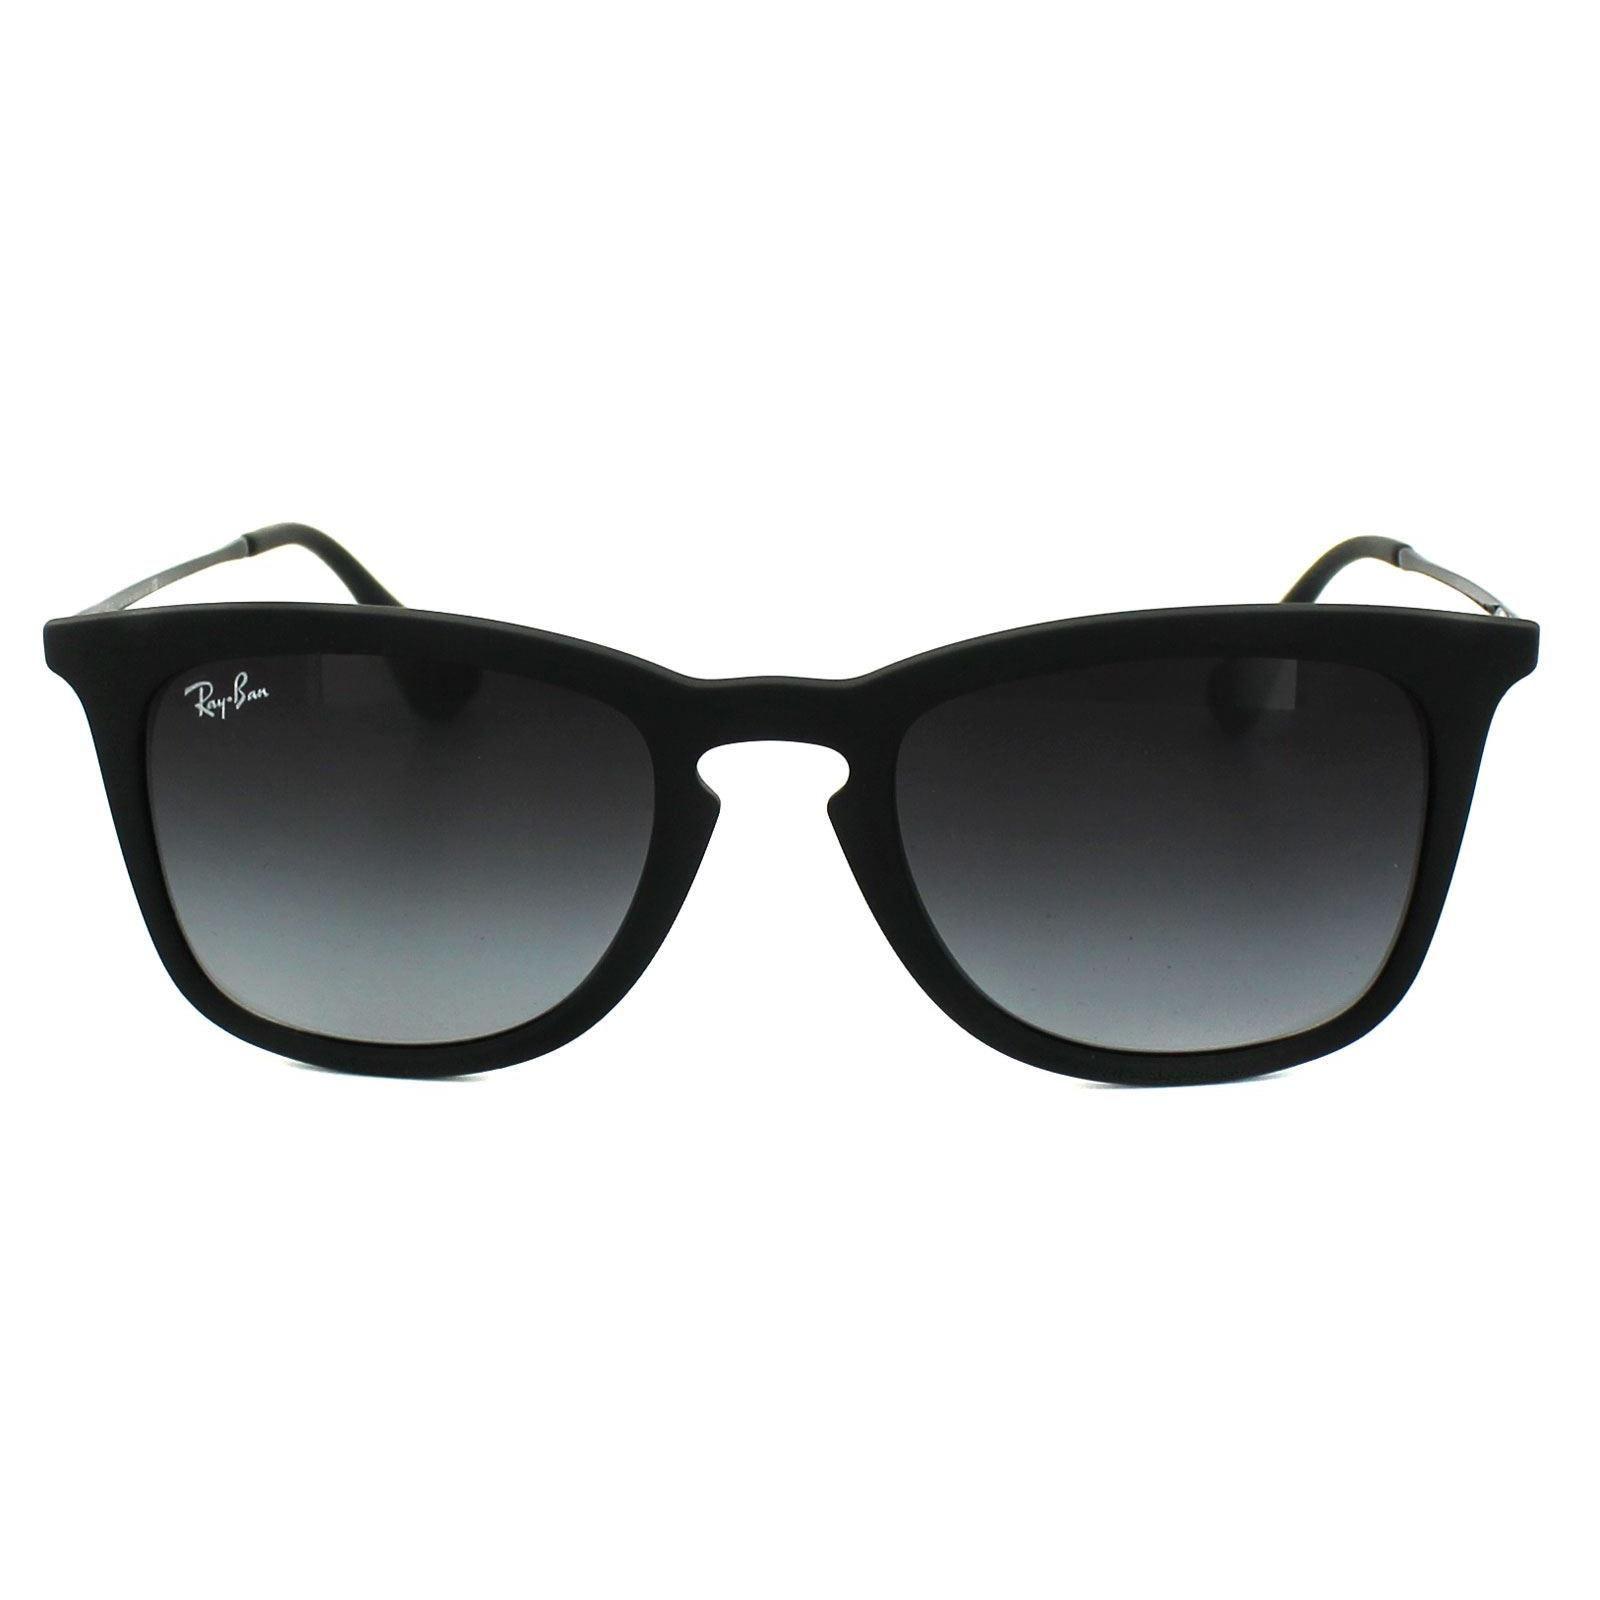 Ray-Ban Sunglasses 4221 622/8G Black Rubber Grey Gradient